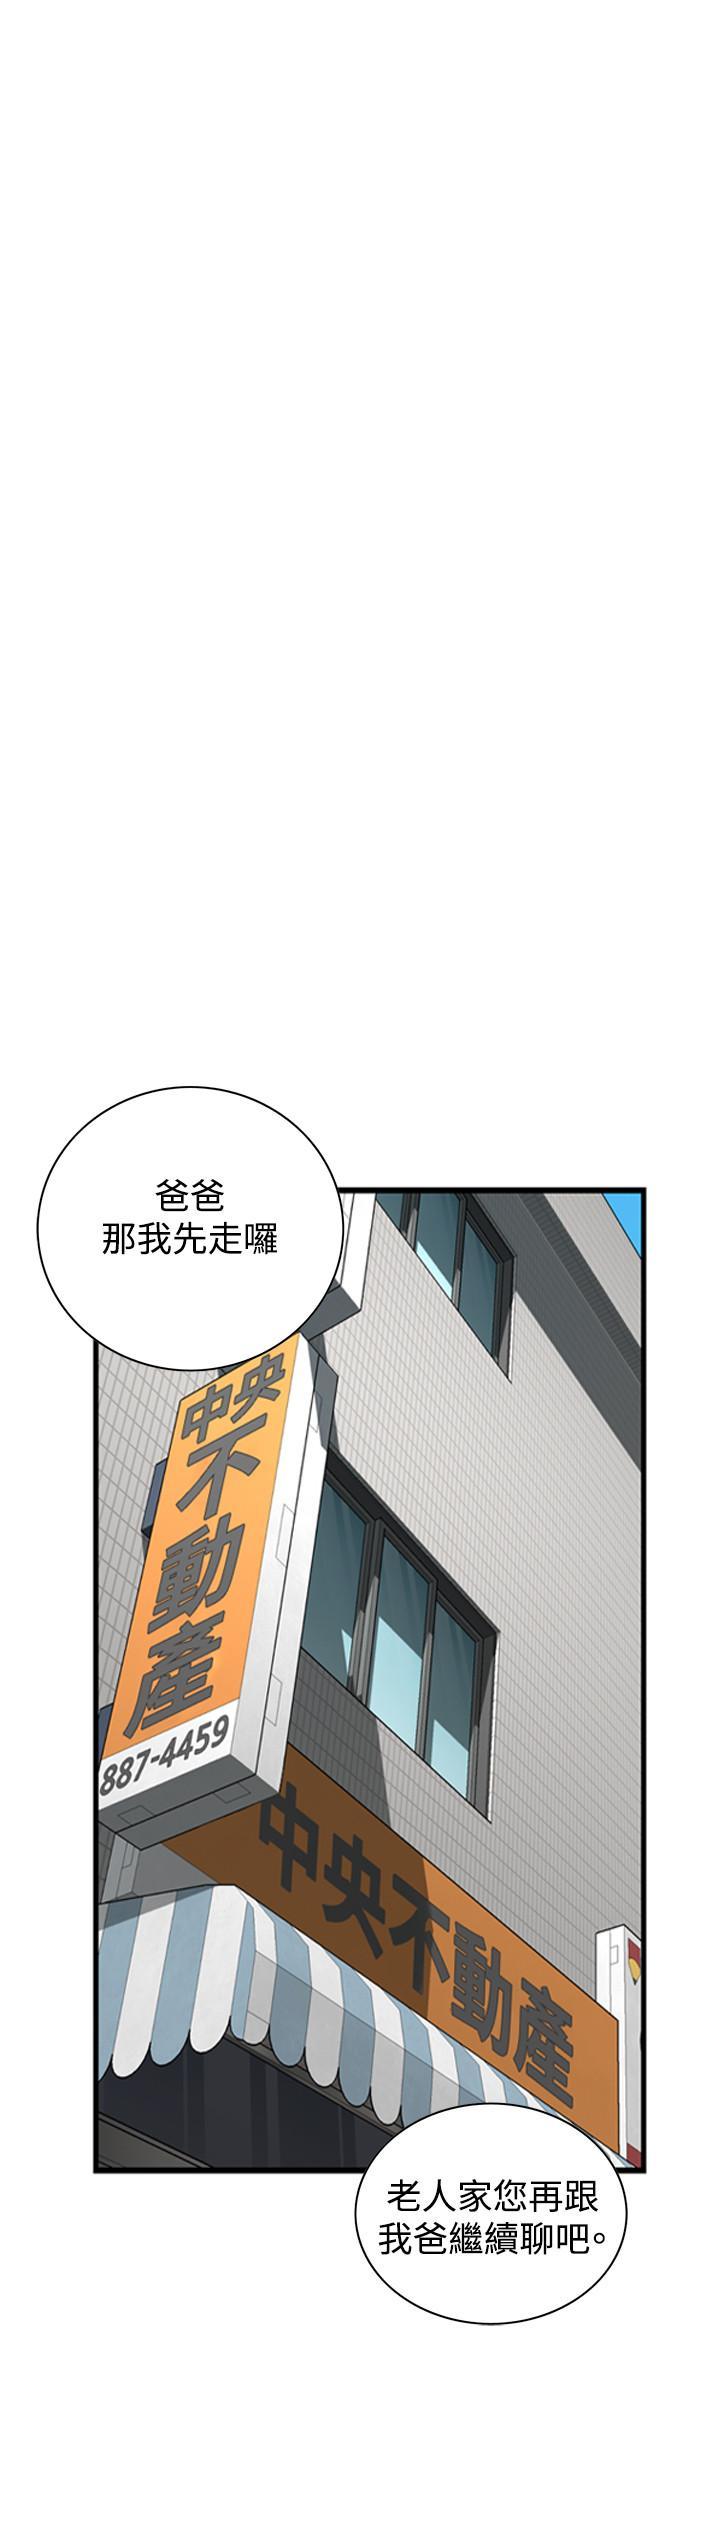 Take a Peek 偷窥 Ch.39~60 [Chinese]中文 629